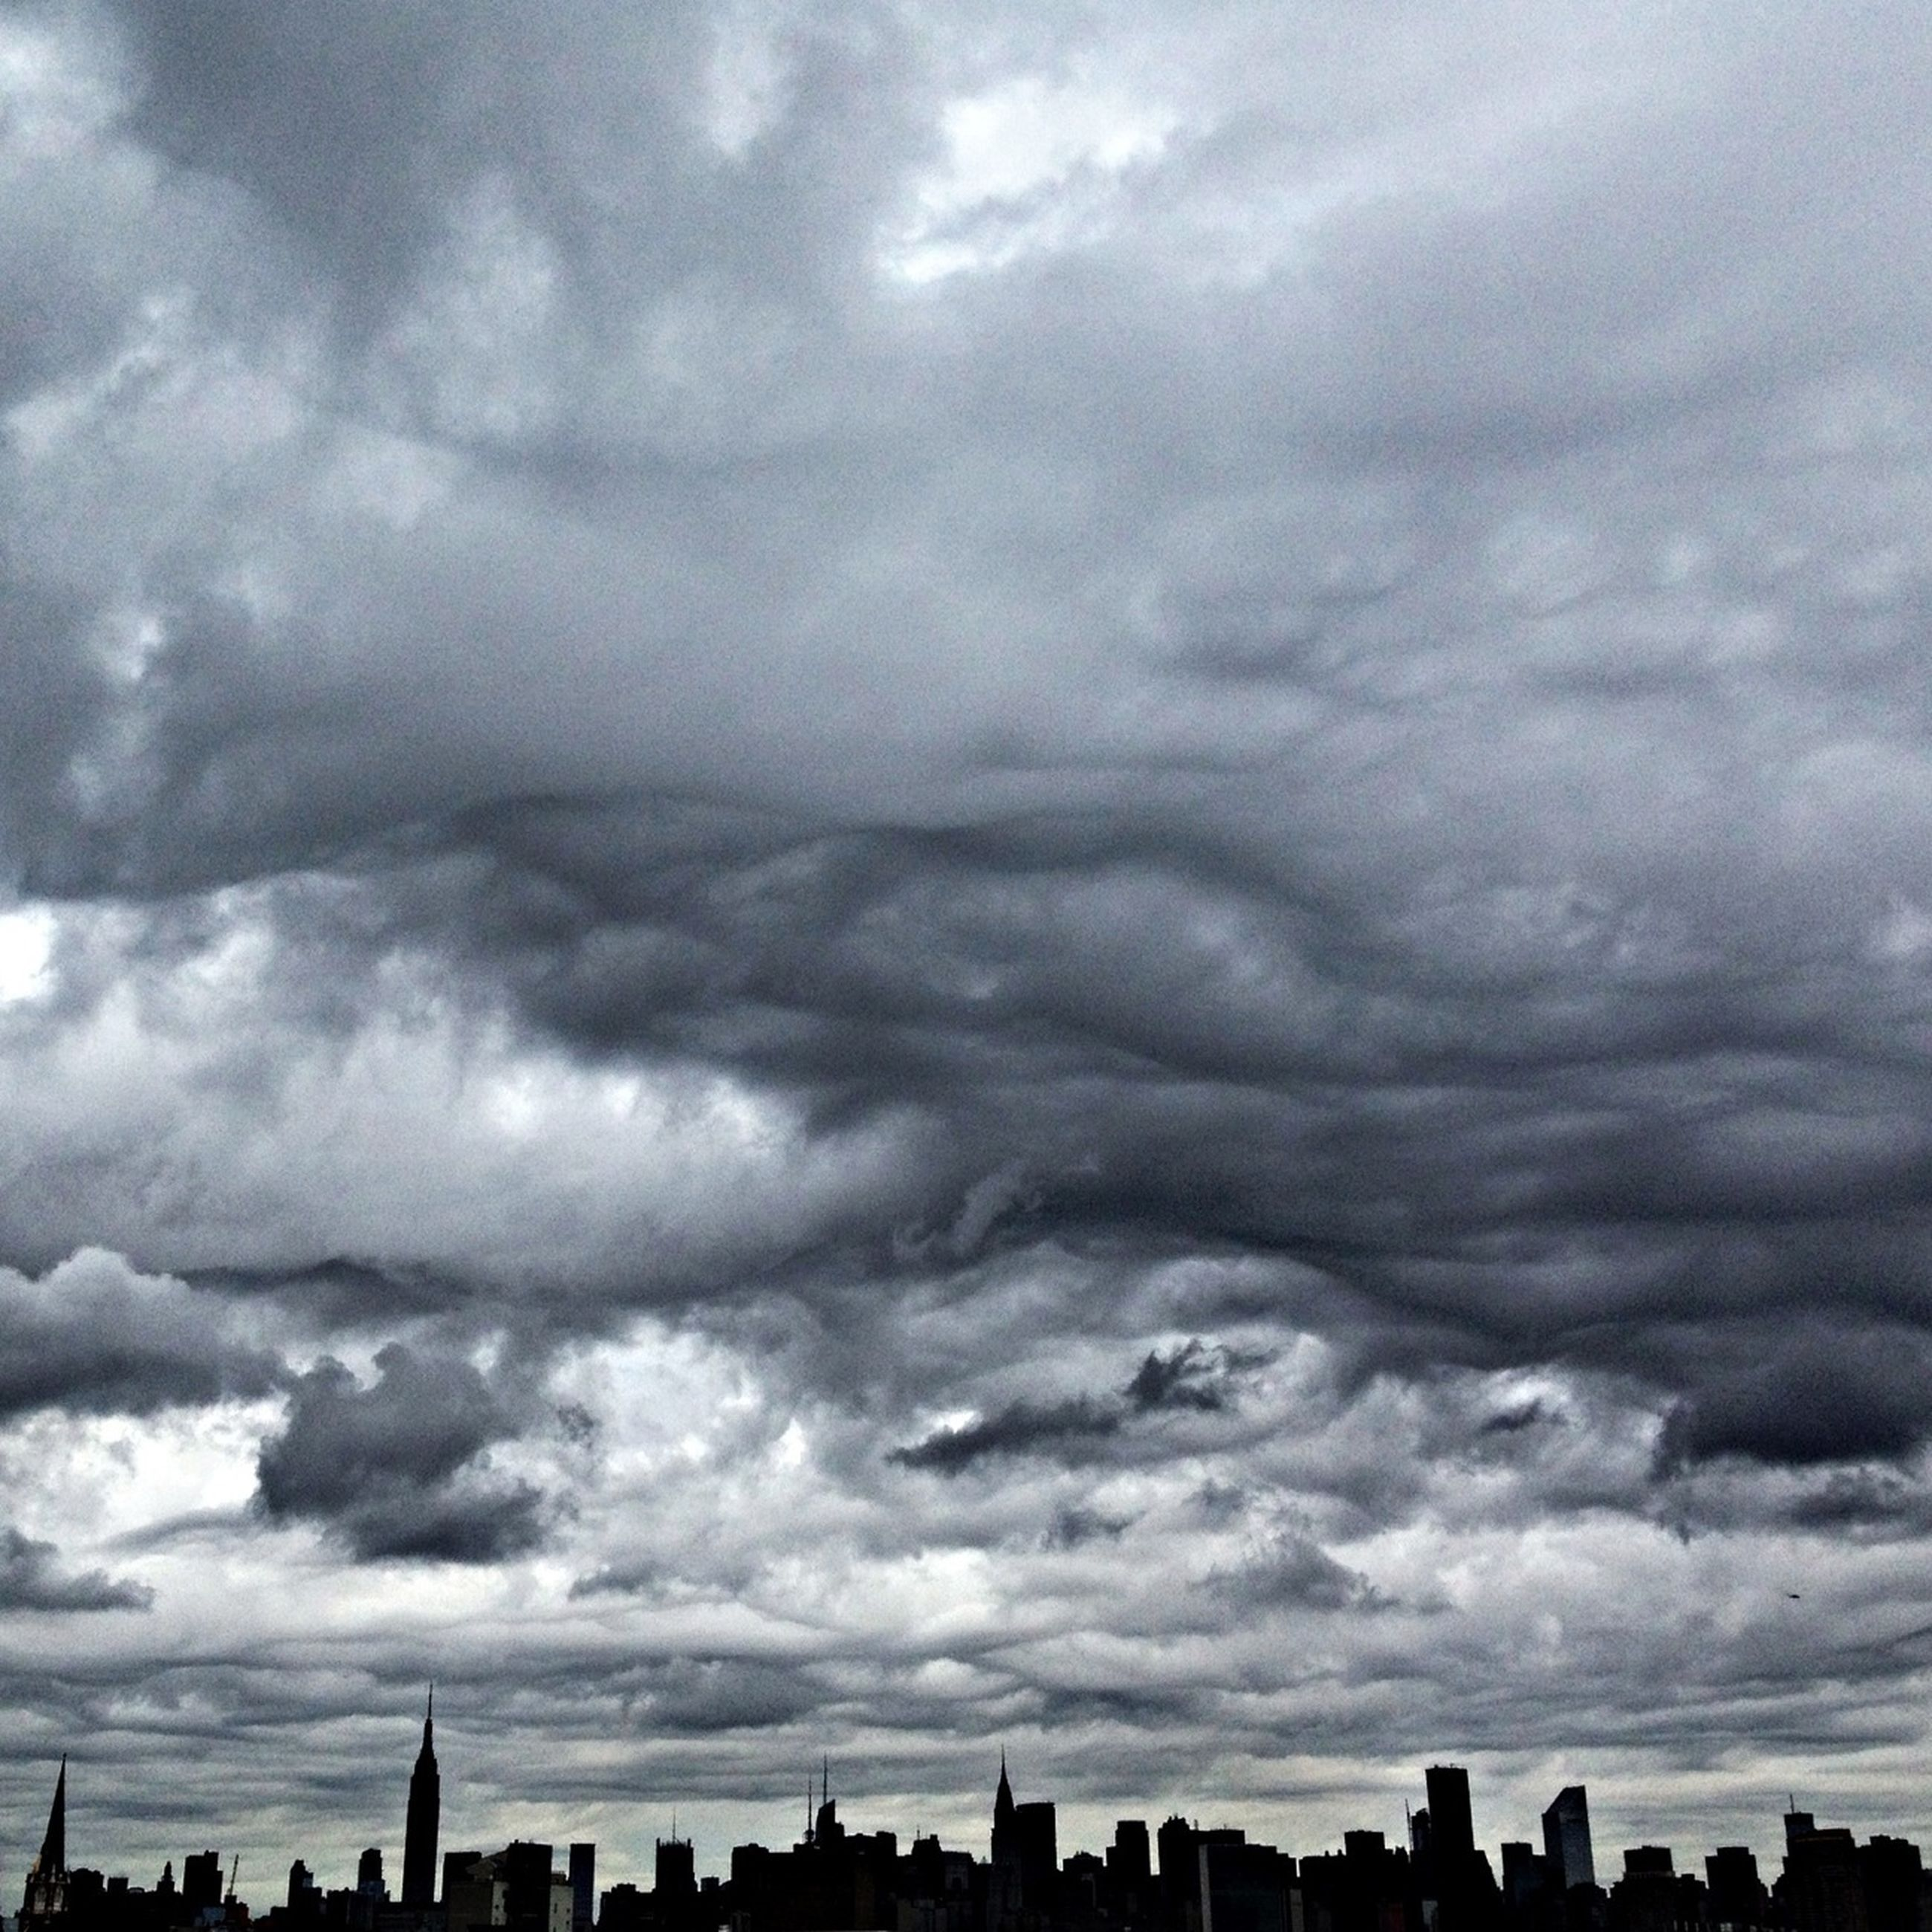 sky, cloud - sky, cloudy, building exterior, architecture, built structure, city, weather, cityscape, overcast, cloud, storm cloud, cloudscape, skyscraper, nature, silhouette, low angle view, outdoors, scenics, urban skyline